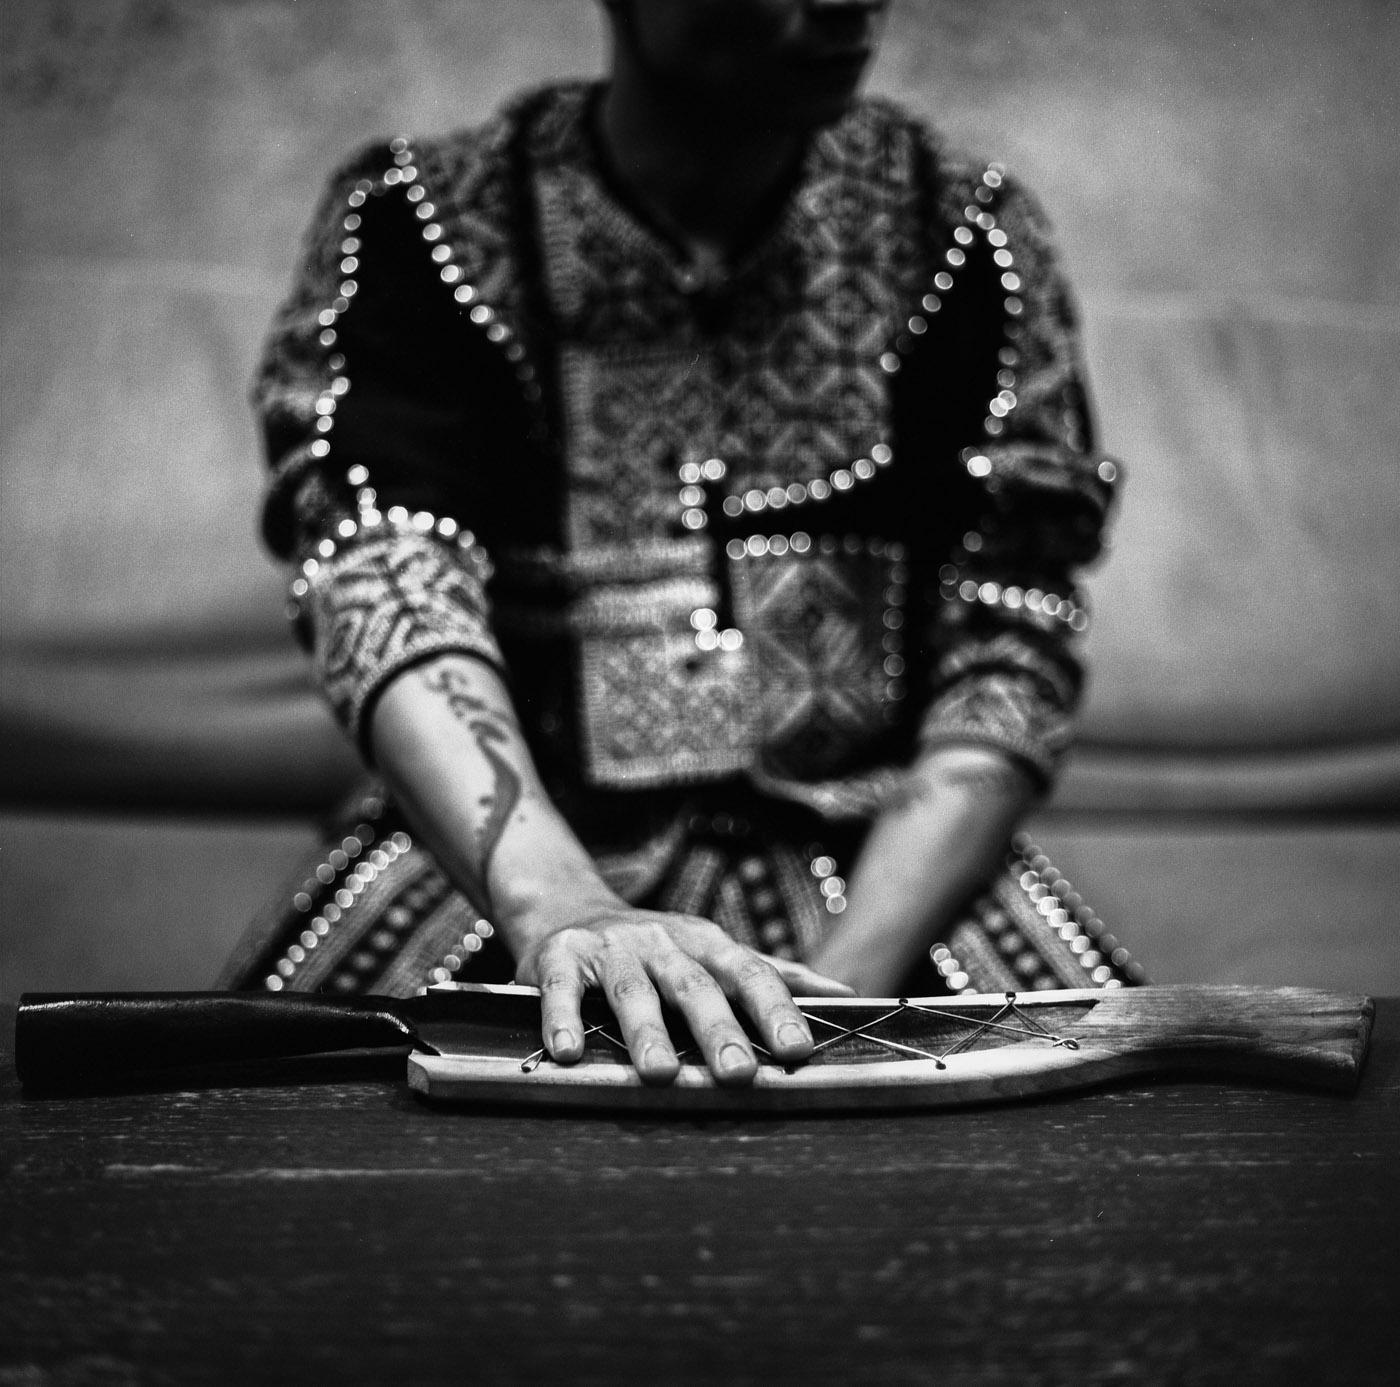 Hsuan_Chung_Formosa_Aborigines_10.jpg